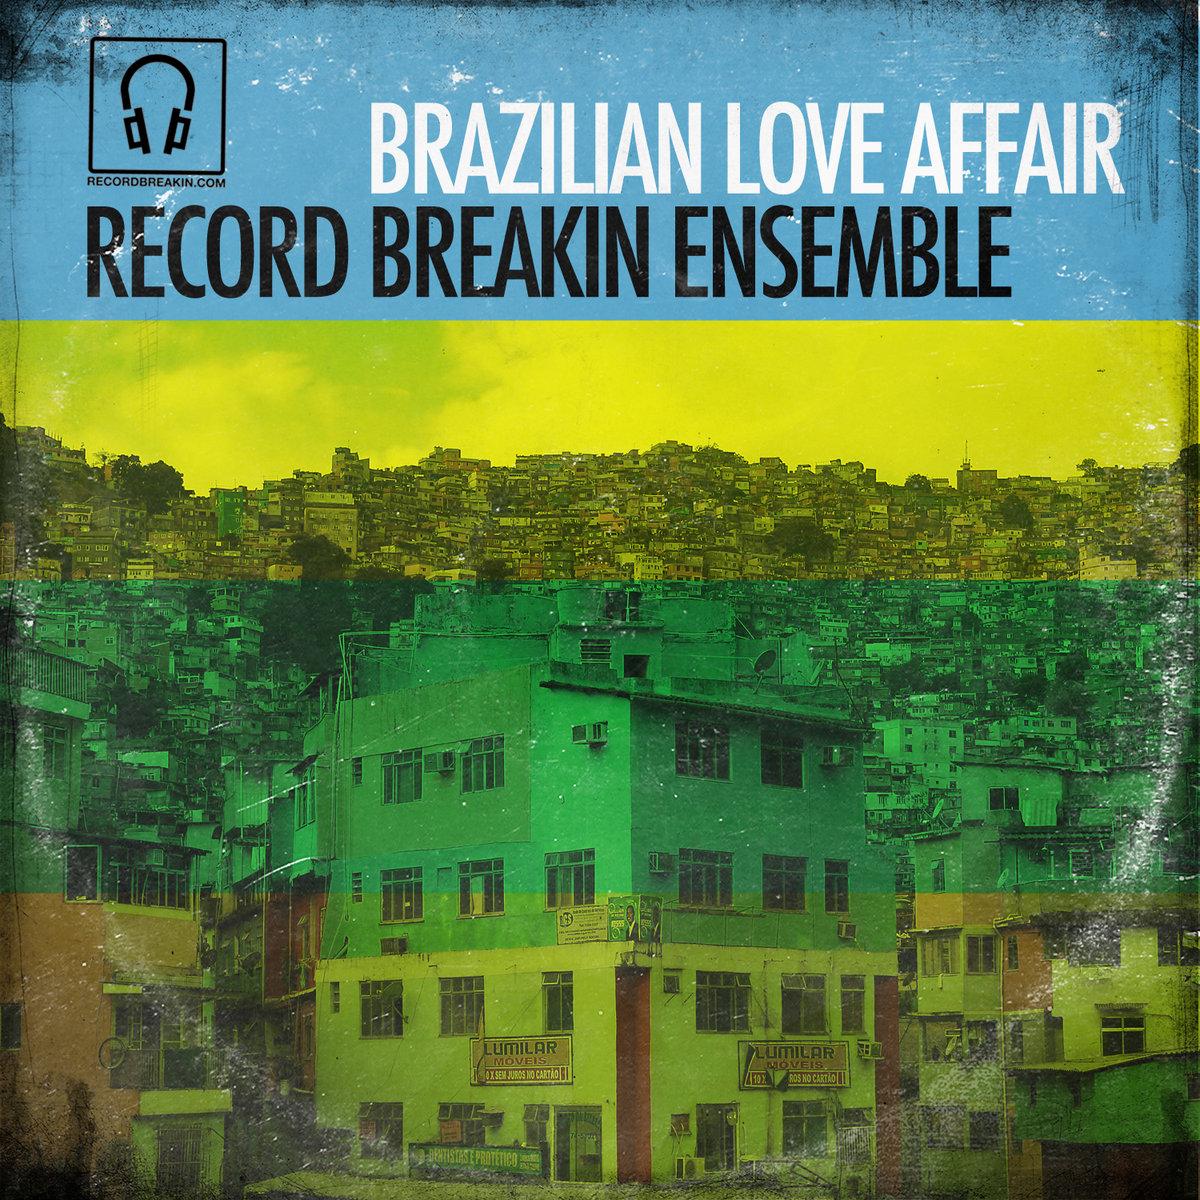 ARTIST: Record Breakin Ensemble    ALBUM: Brazilian Love Affair